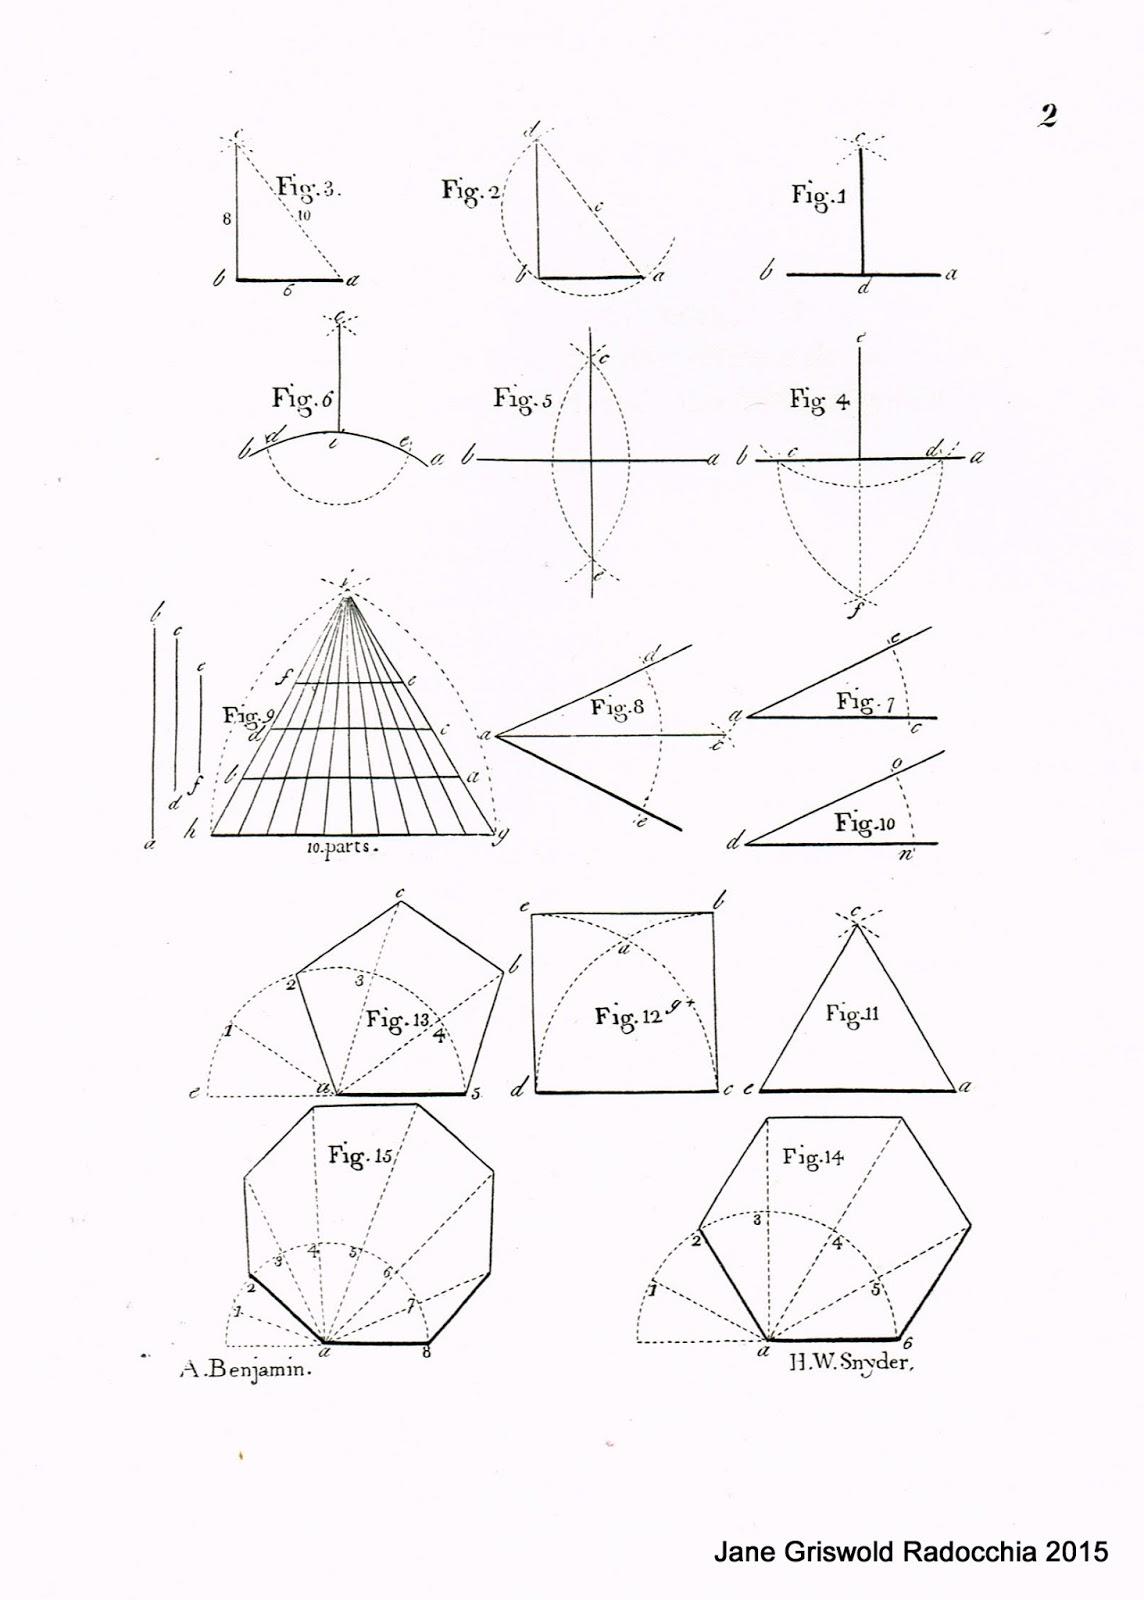 Jane Griswold Radocchia: Geometry of the Cobb-Hepburn